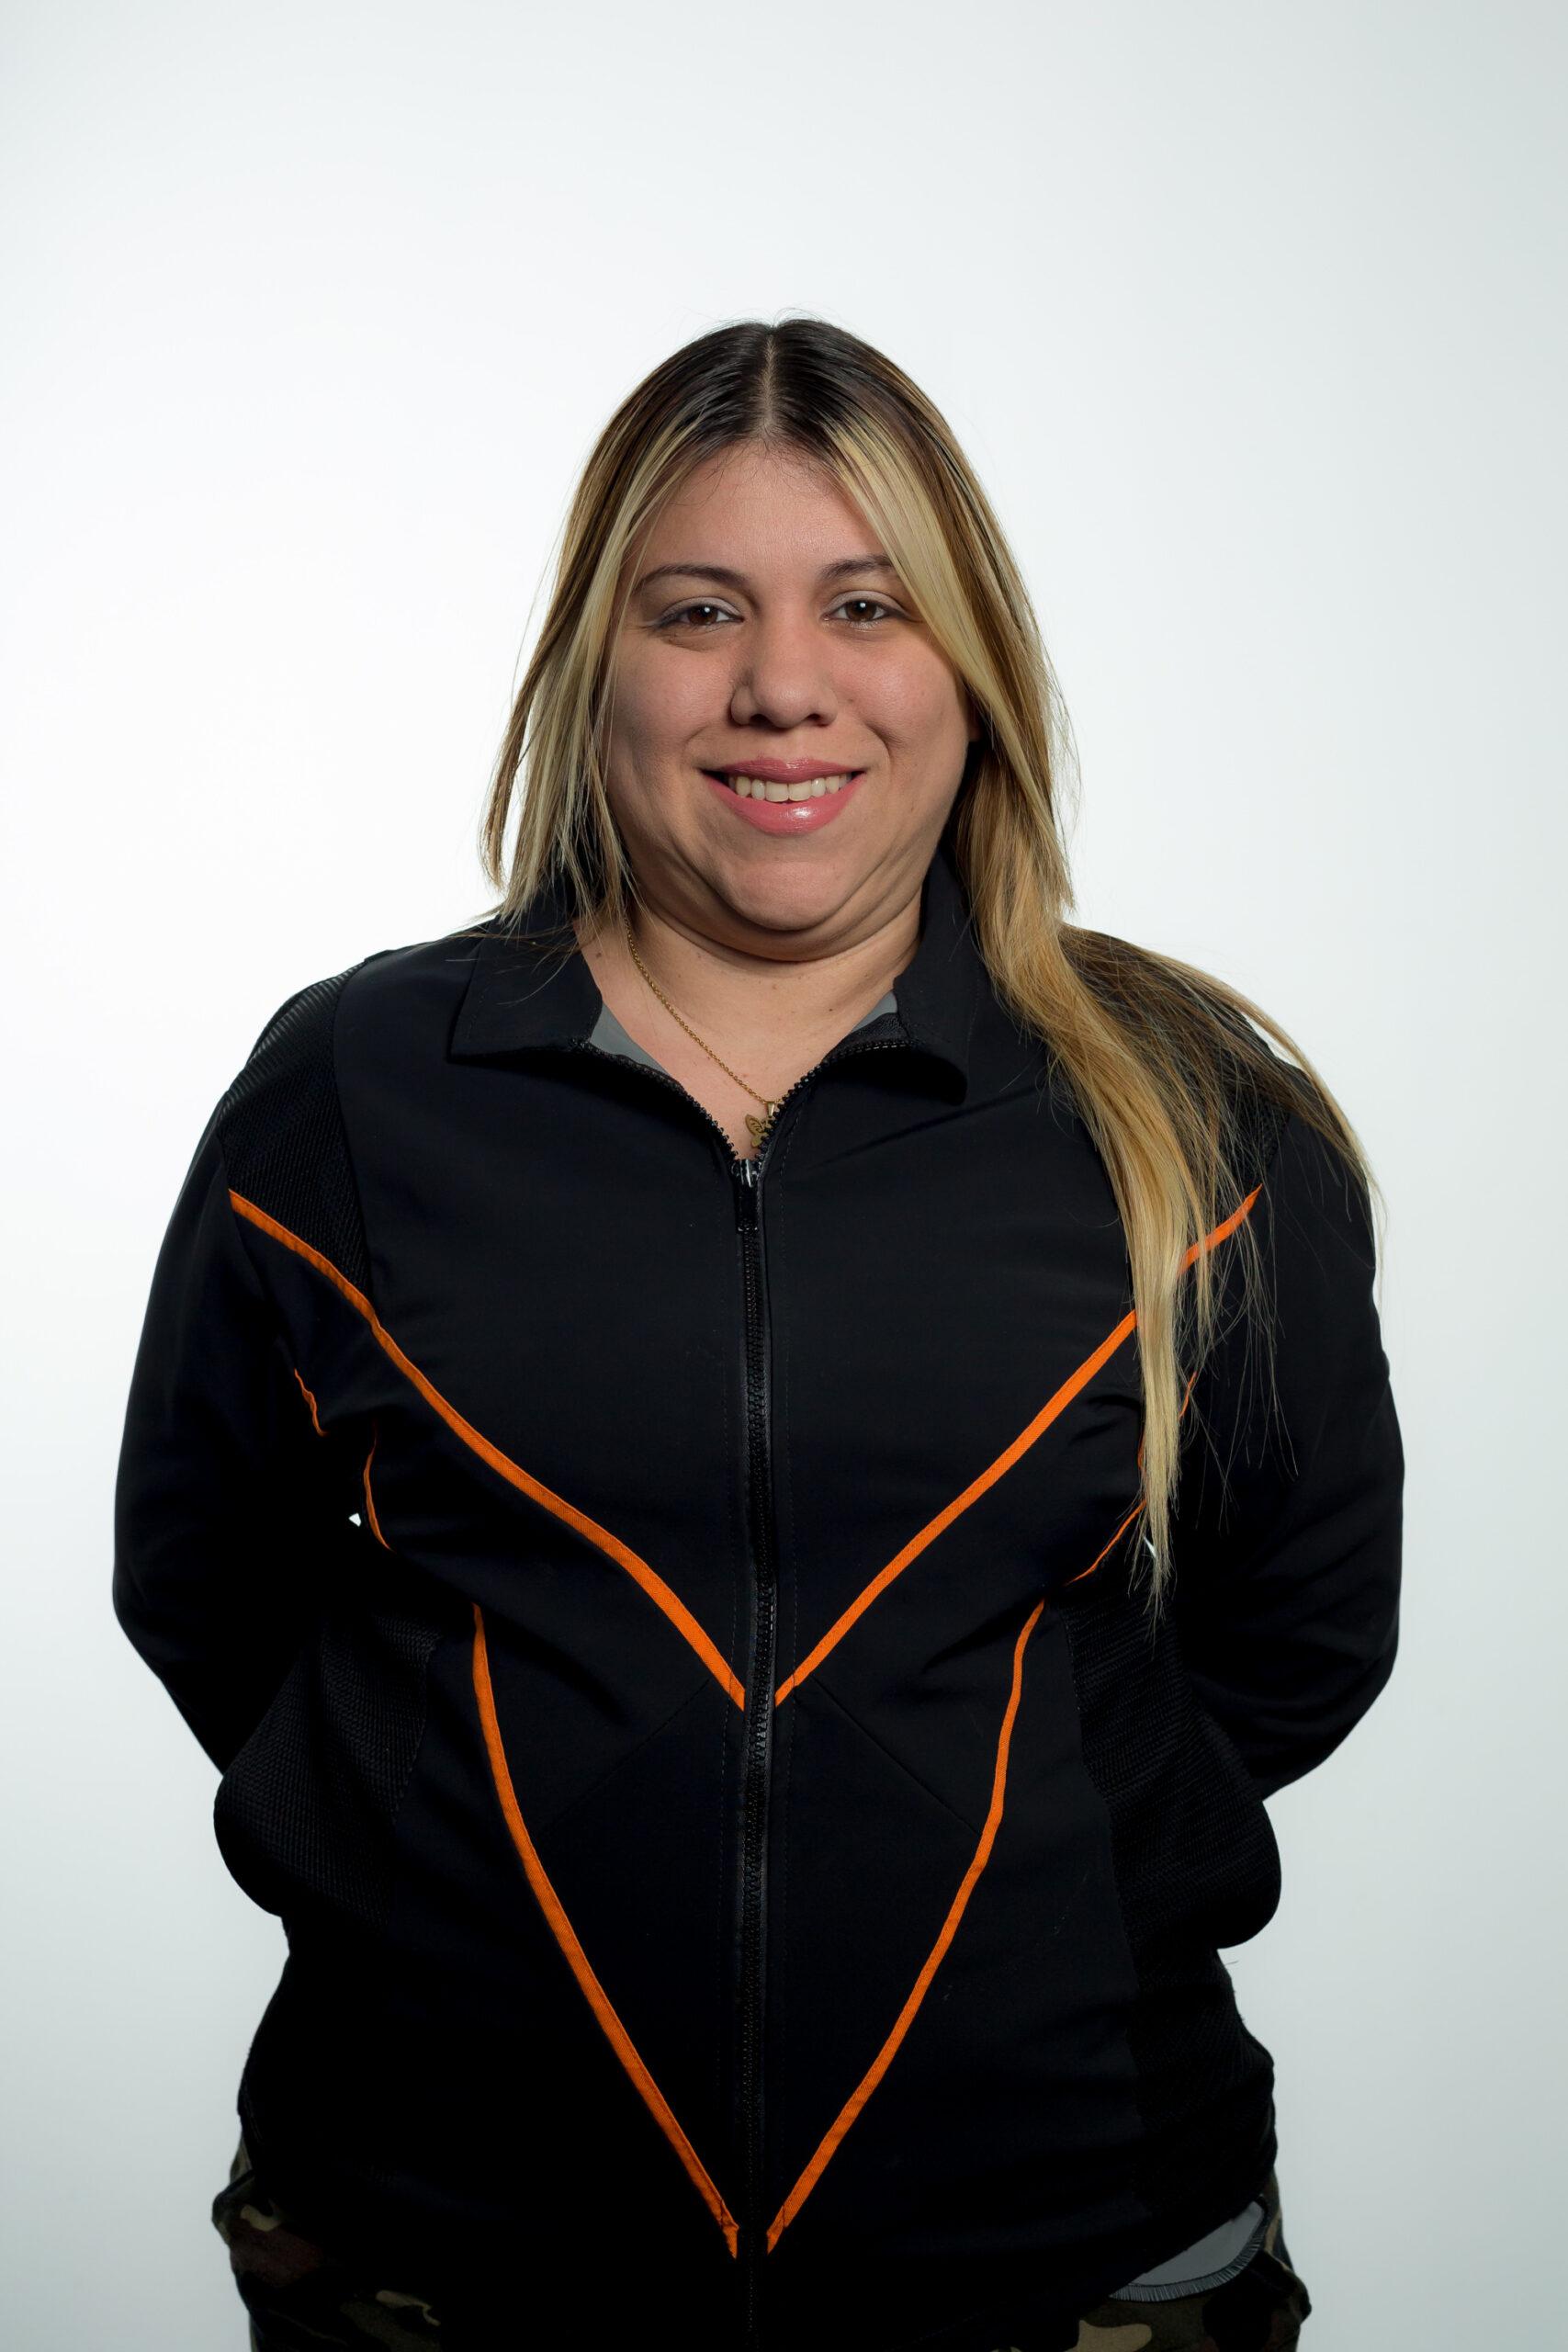 Deisy Benitez